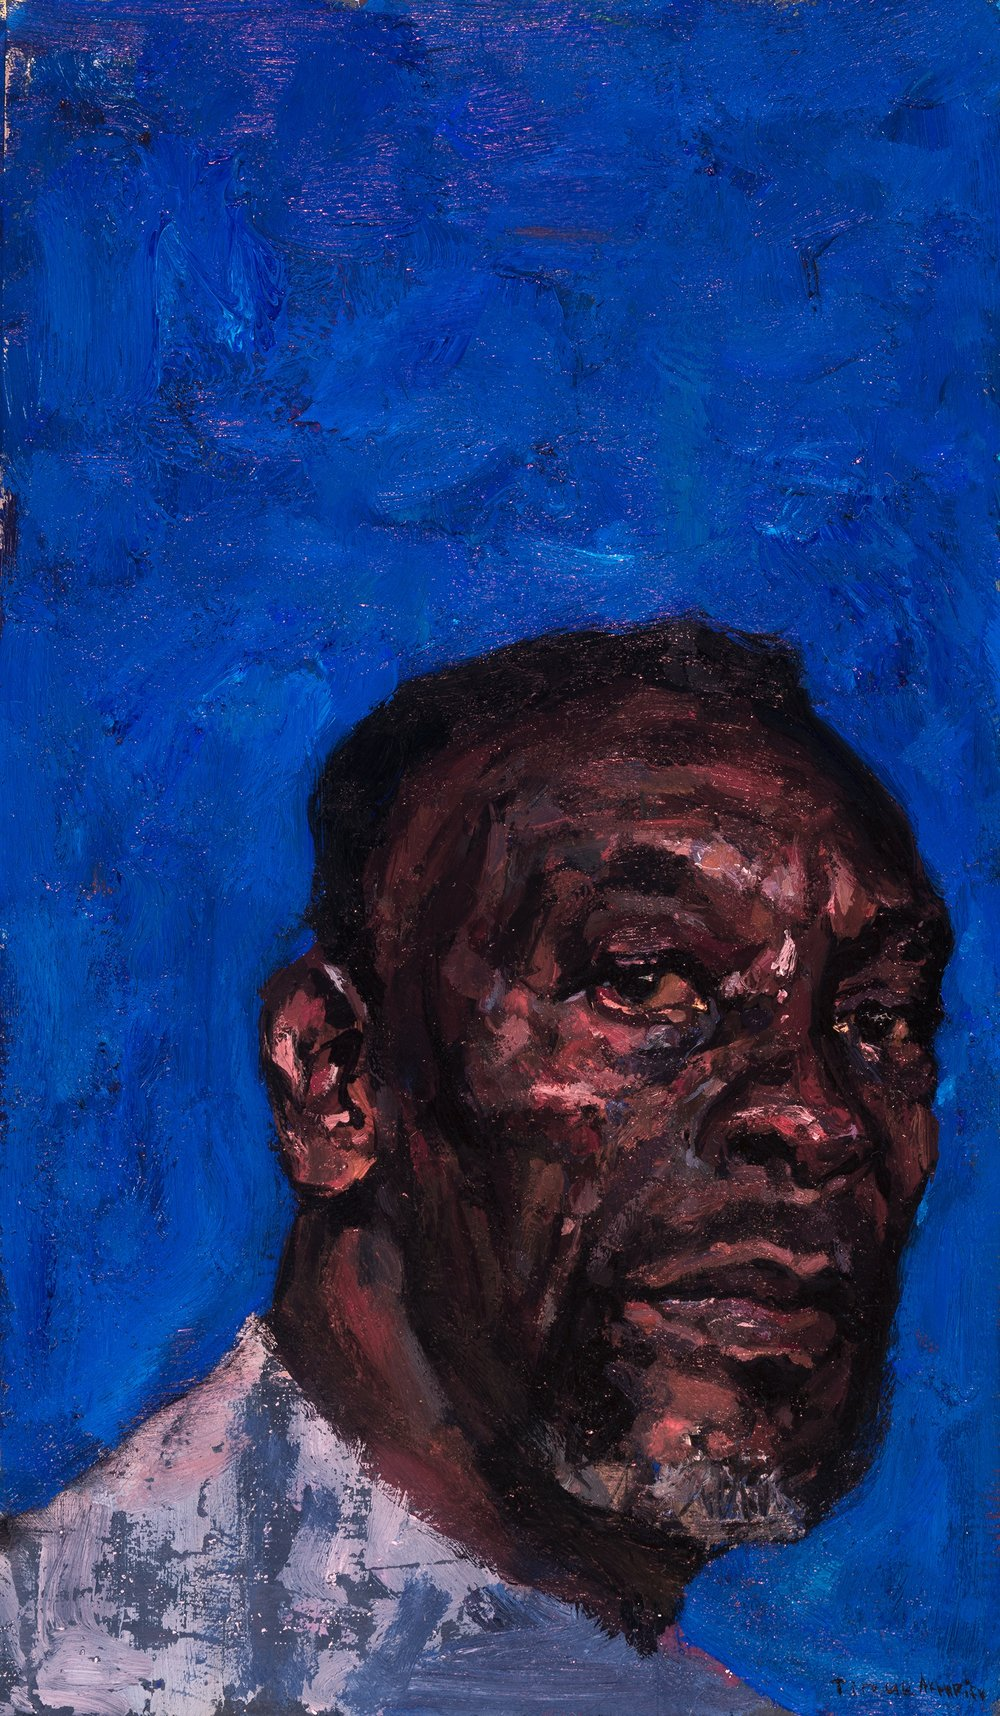 Timur Akhriev Title: Poet I Size: 7 x 12 Oil on Linen Panel Sold